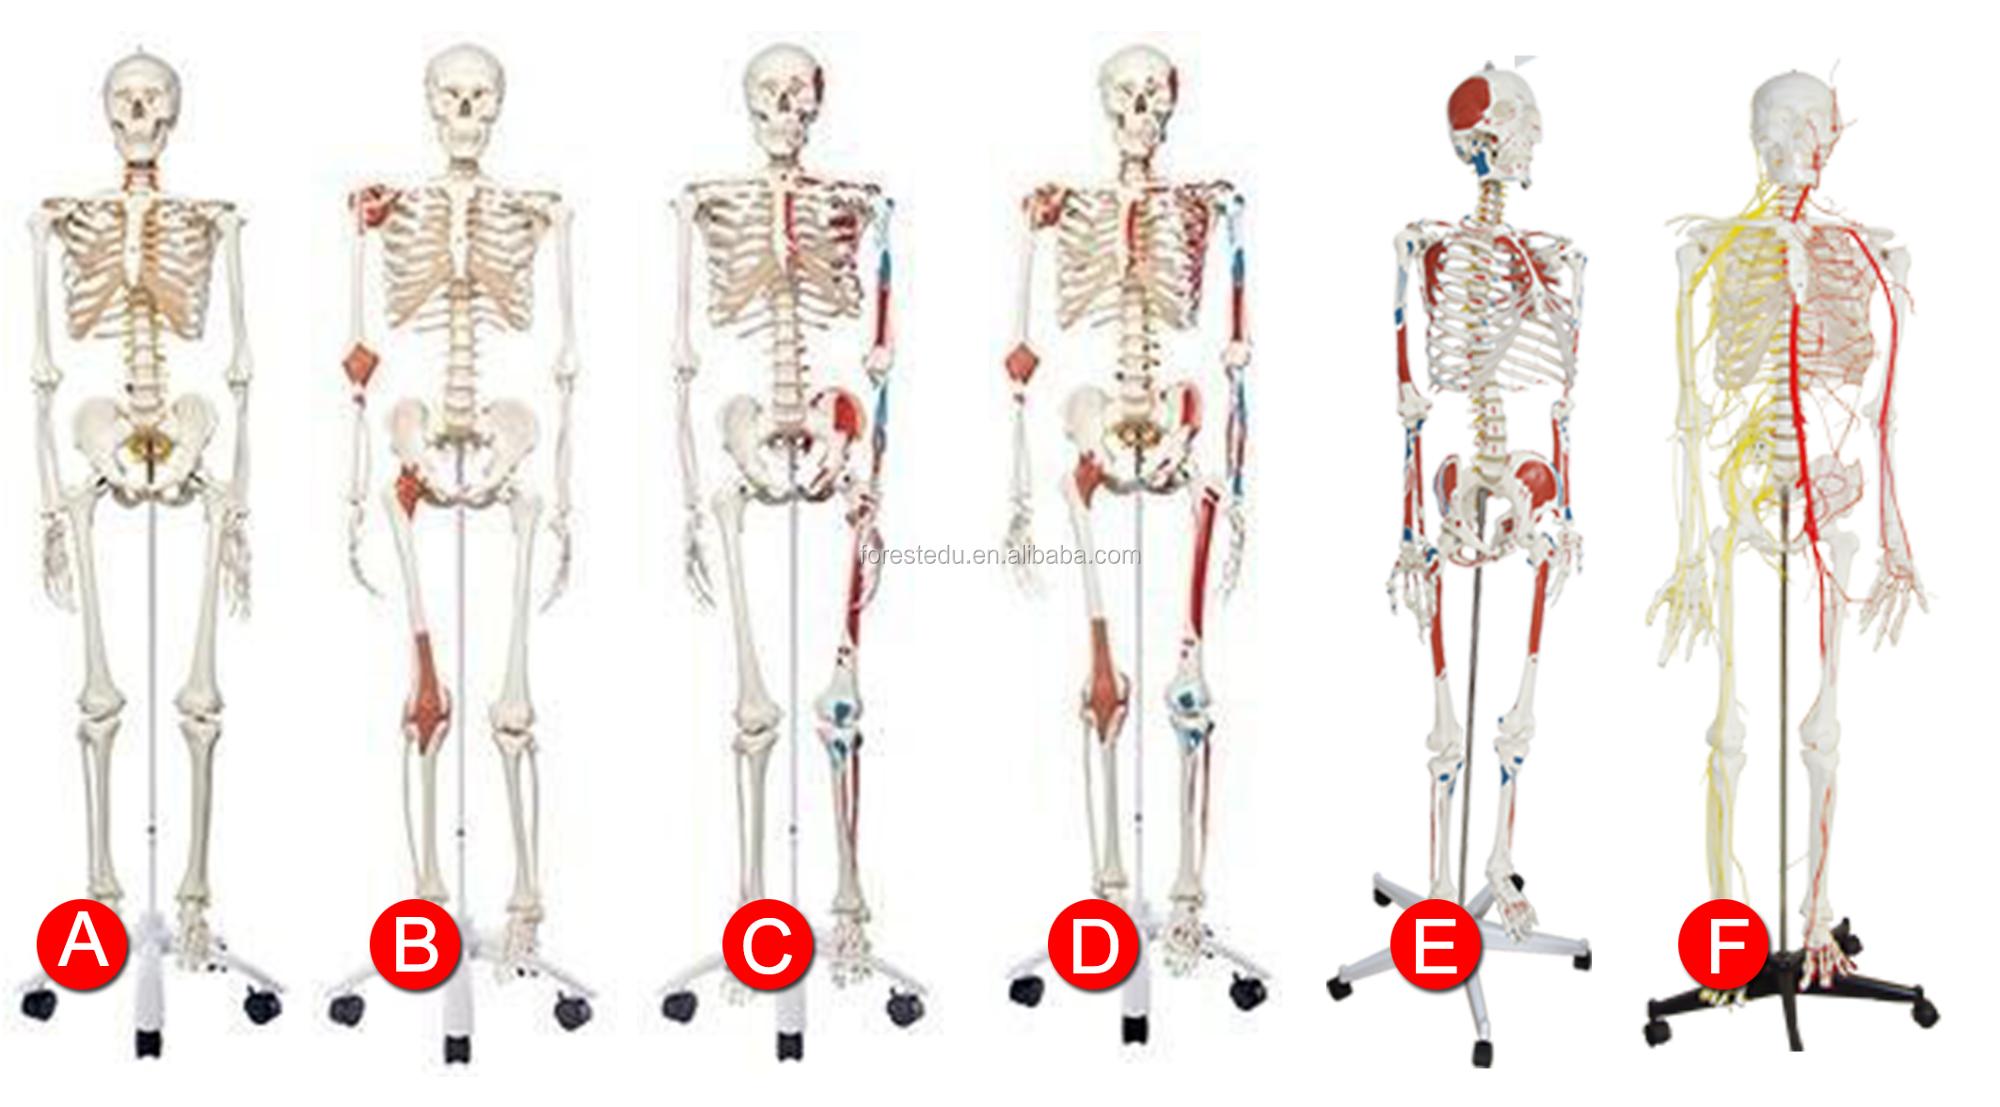 Standard Skeleton Rod Mount Legs Removable Life Size 180cm Human